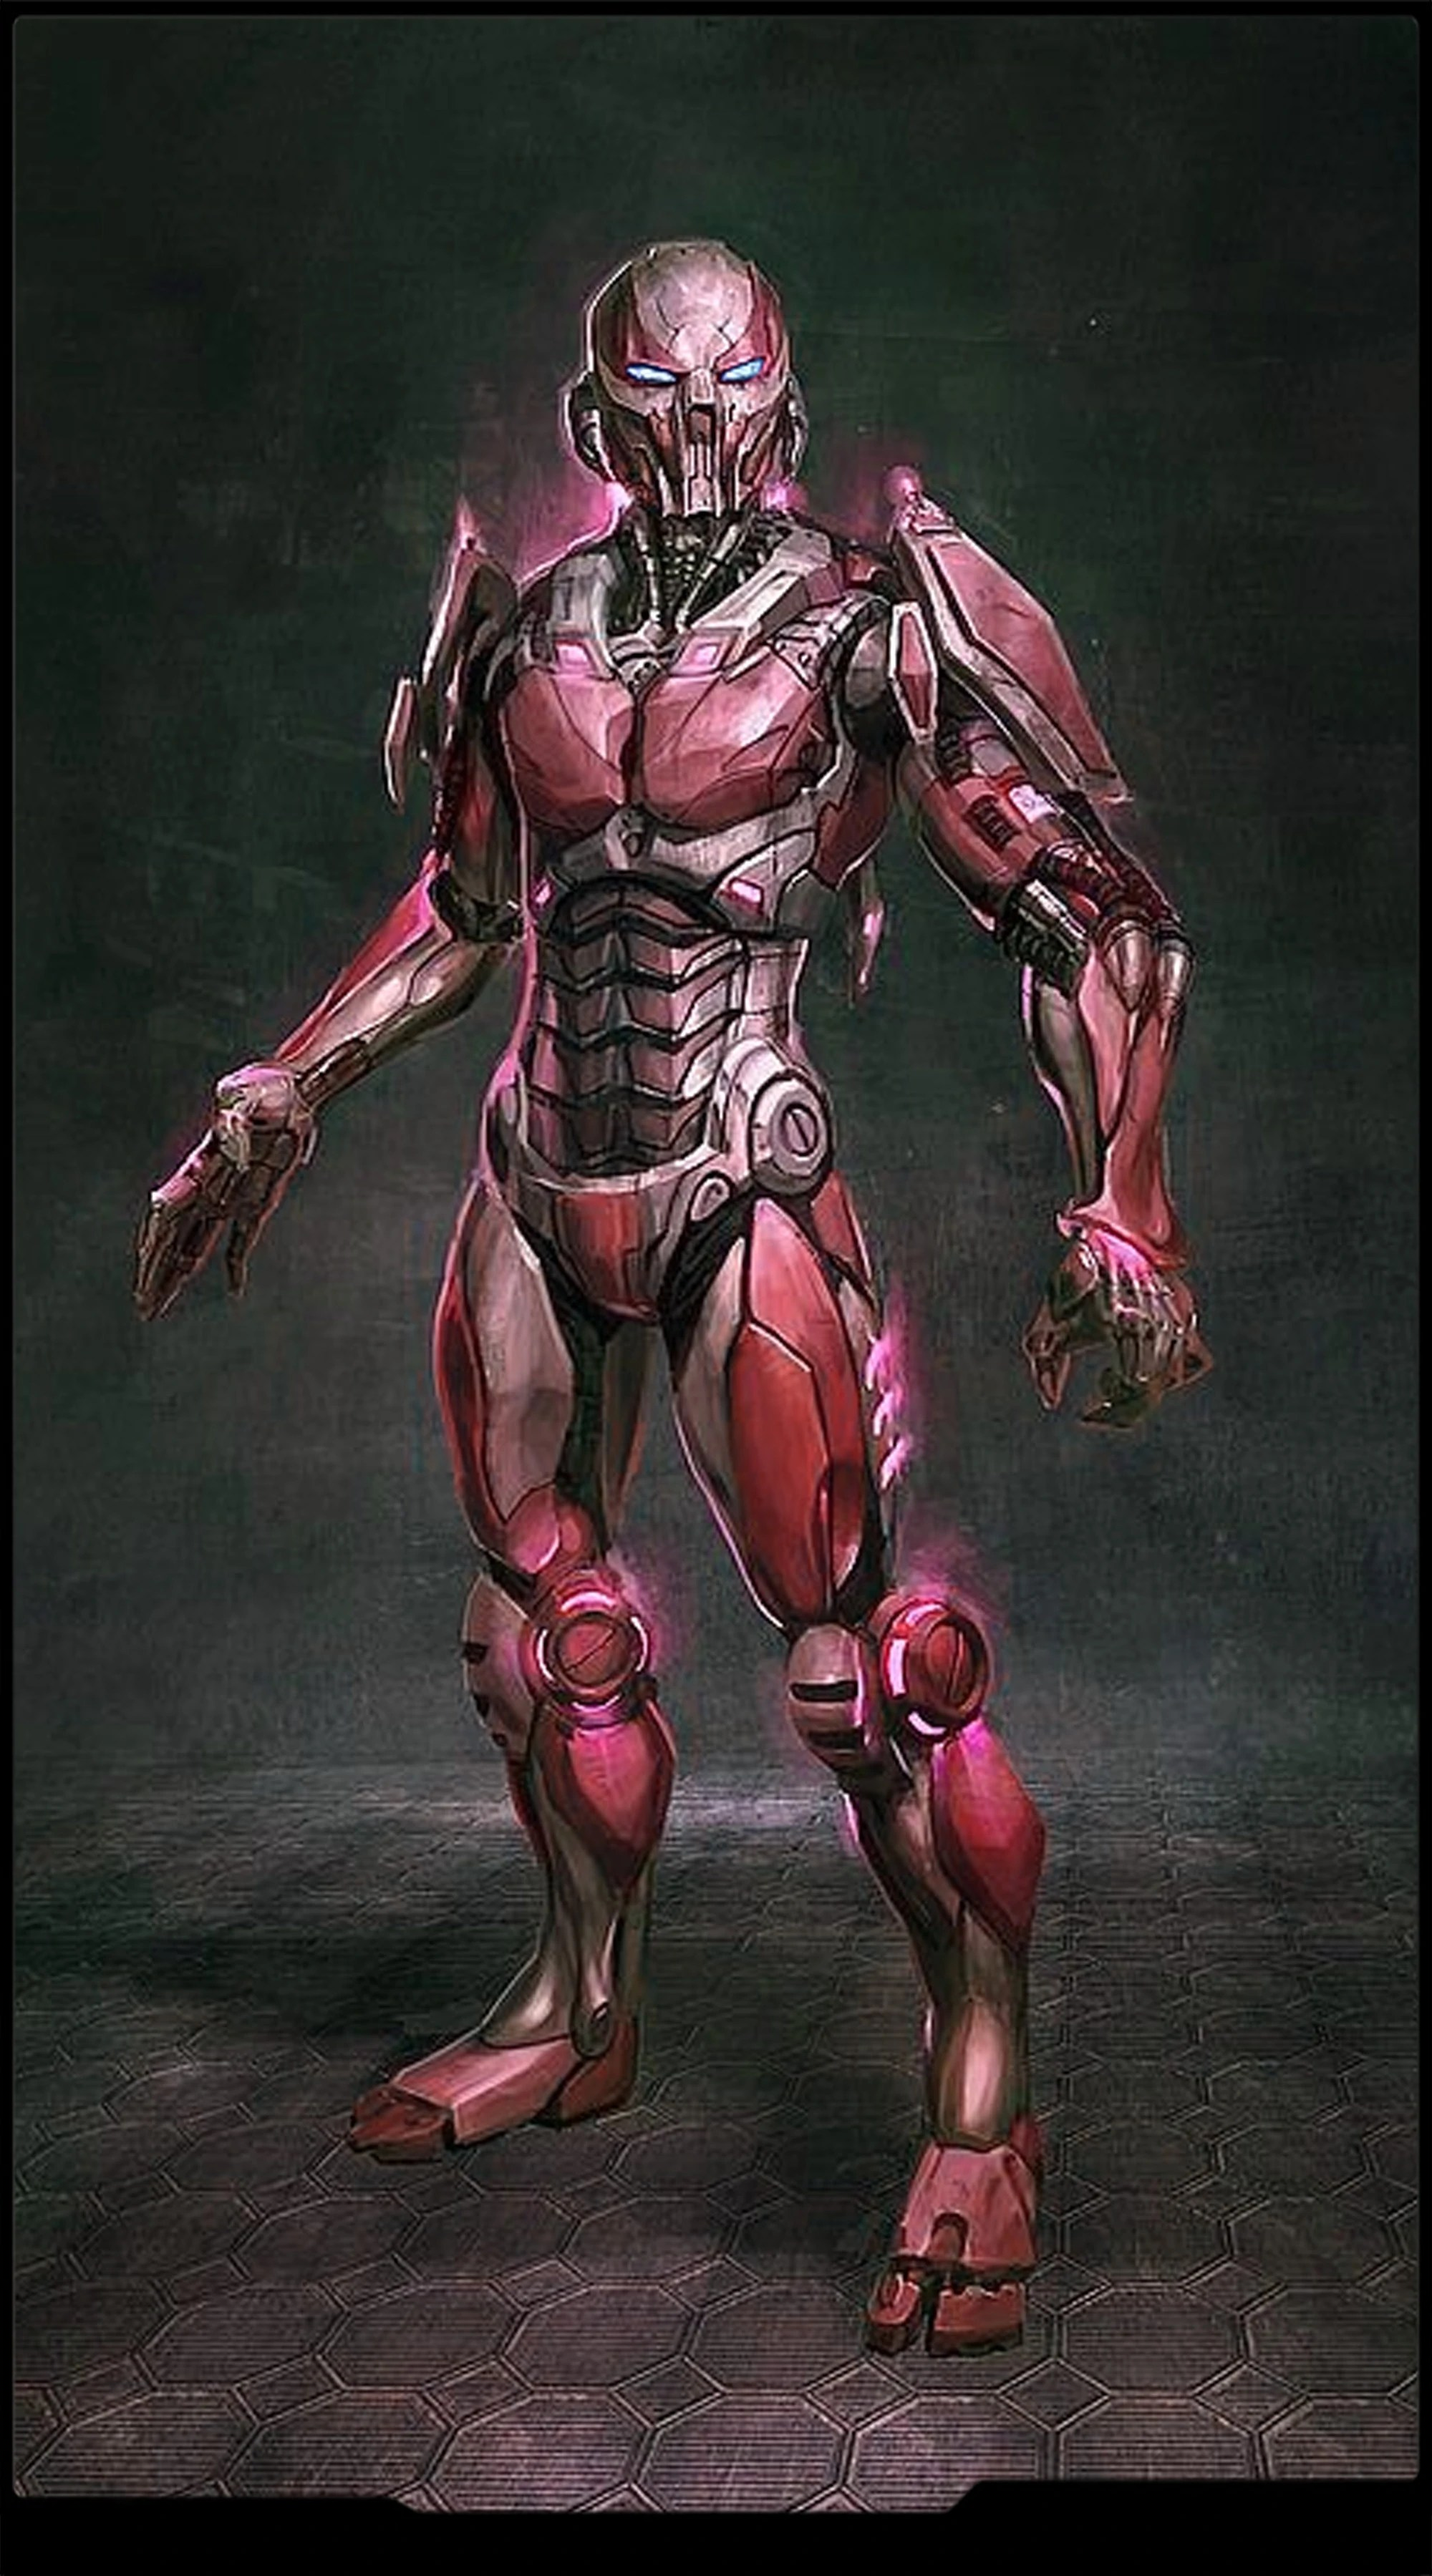 Hd Supreme Wallpaper High Evolutionary Ultimate Marvel Cinematic Universe